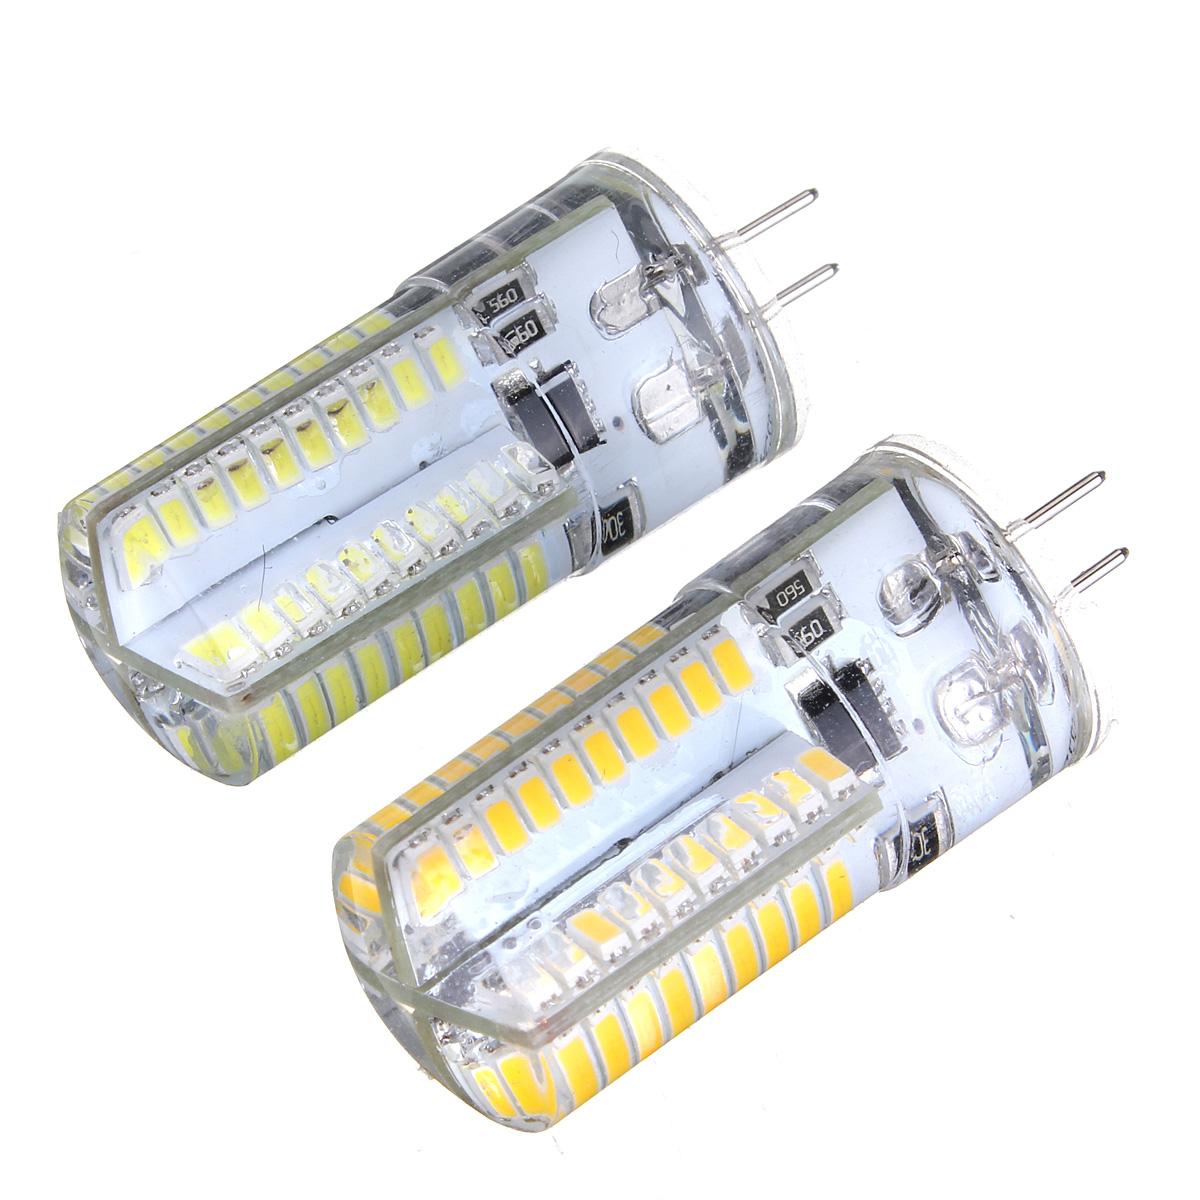 ampoule g4 g9 e12 e14 e17 ba15d dimmable 80 led 3014 smd silicone bulb lampe new ebay. Black Bedroom Furniture Sets. Home Design Ideas